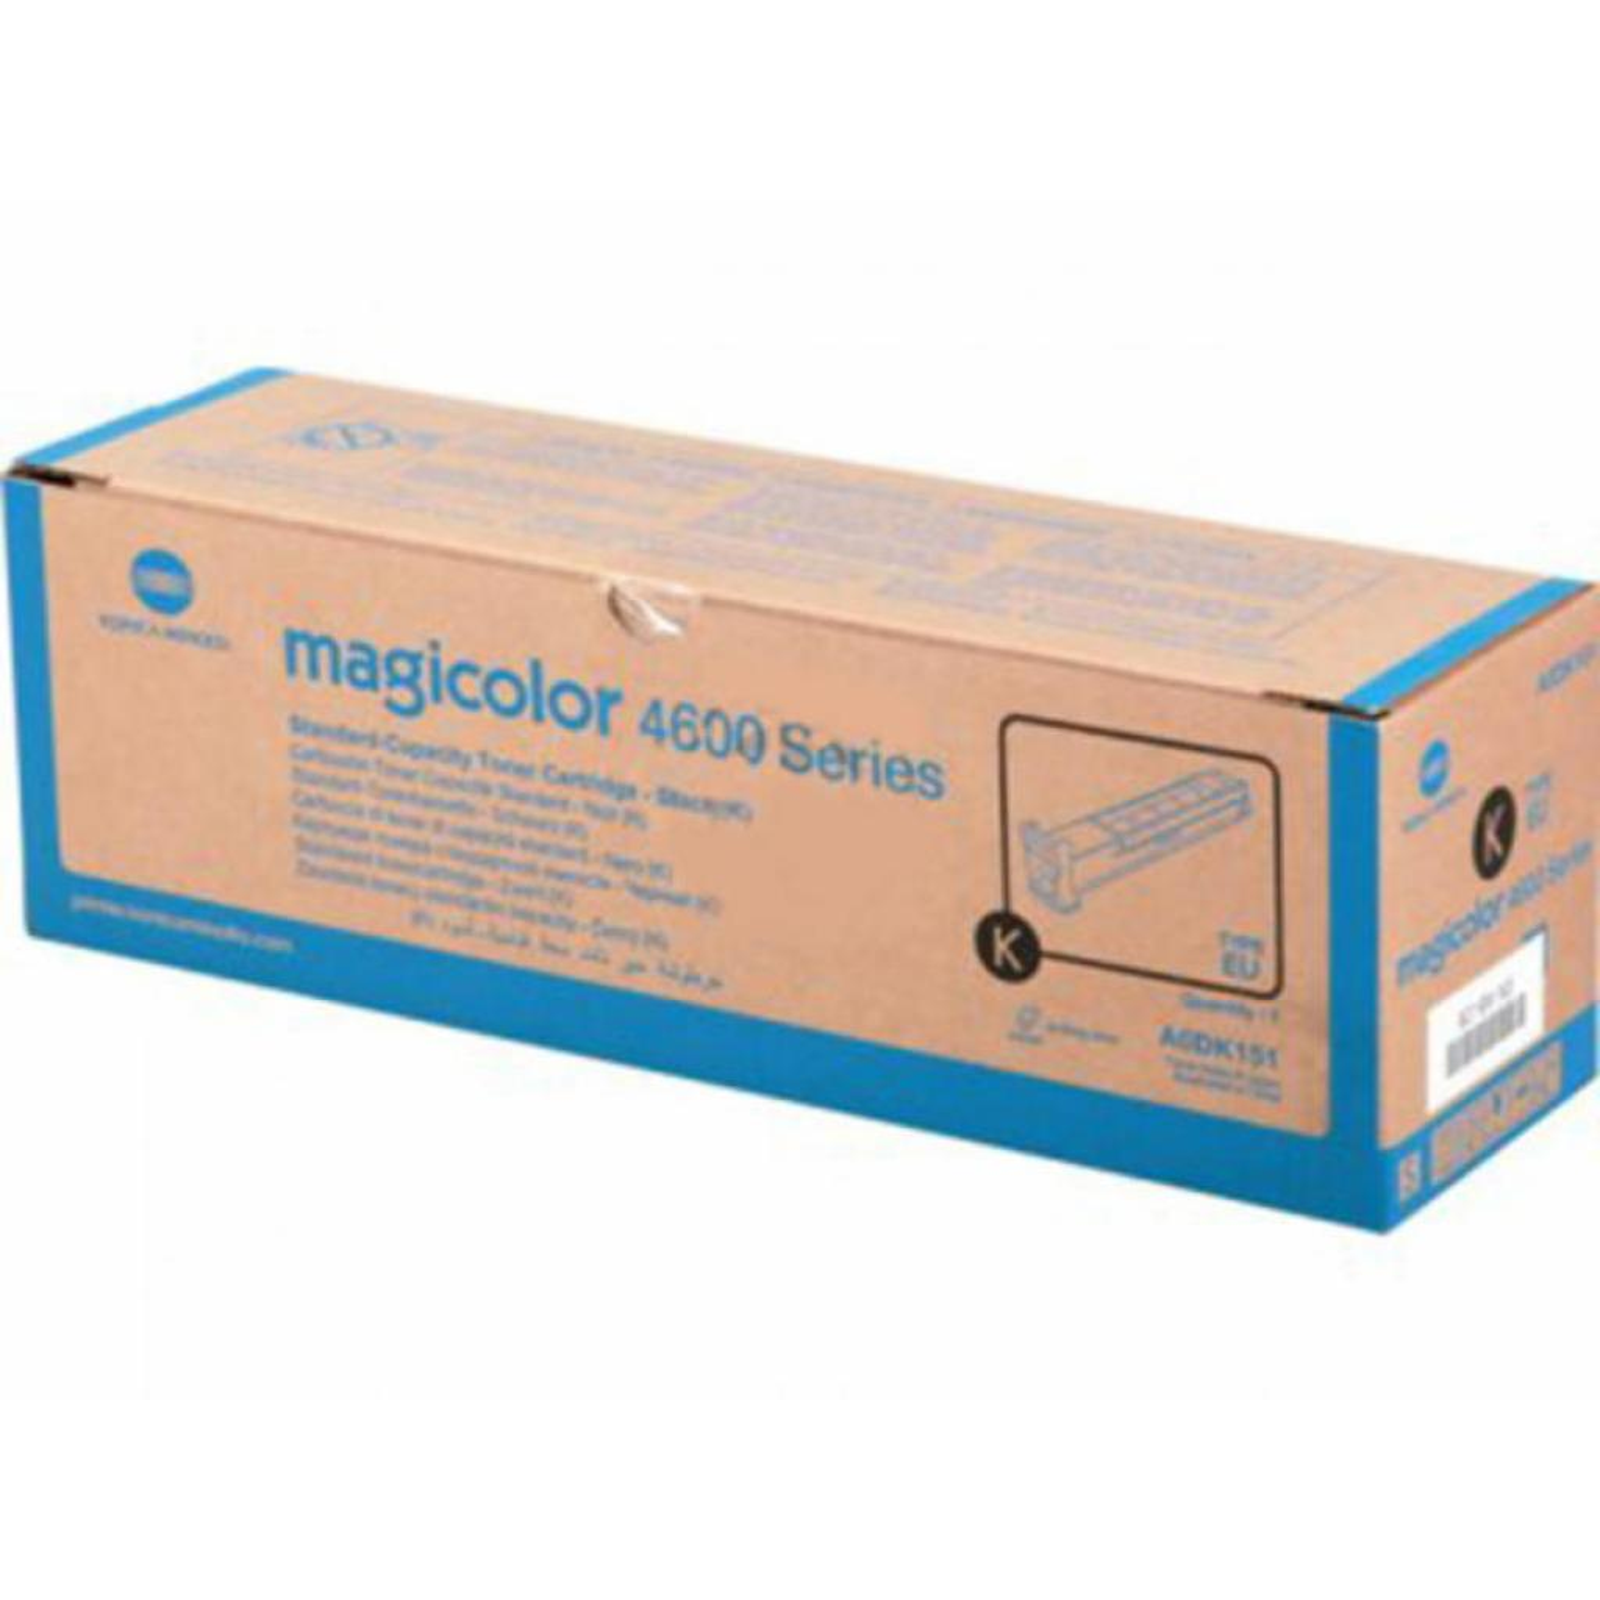 Тонер-картридж KONICA MINOLTA MagiColor 4600 Series (Black) 4К (A0DK151)